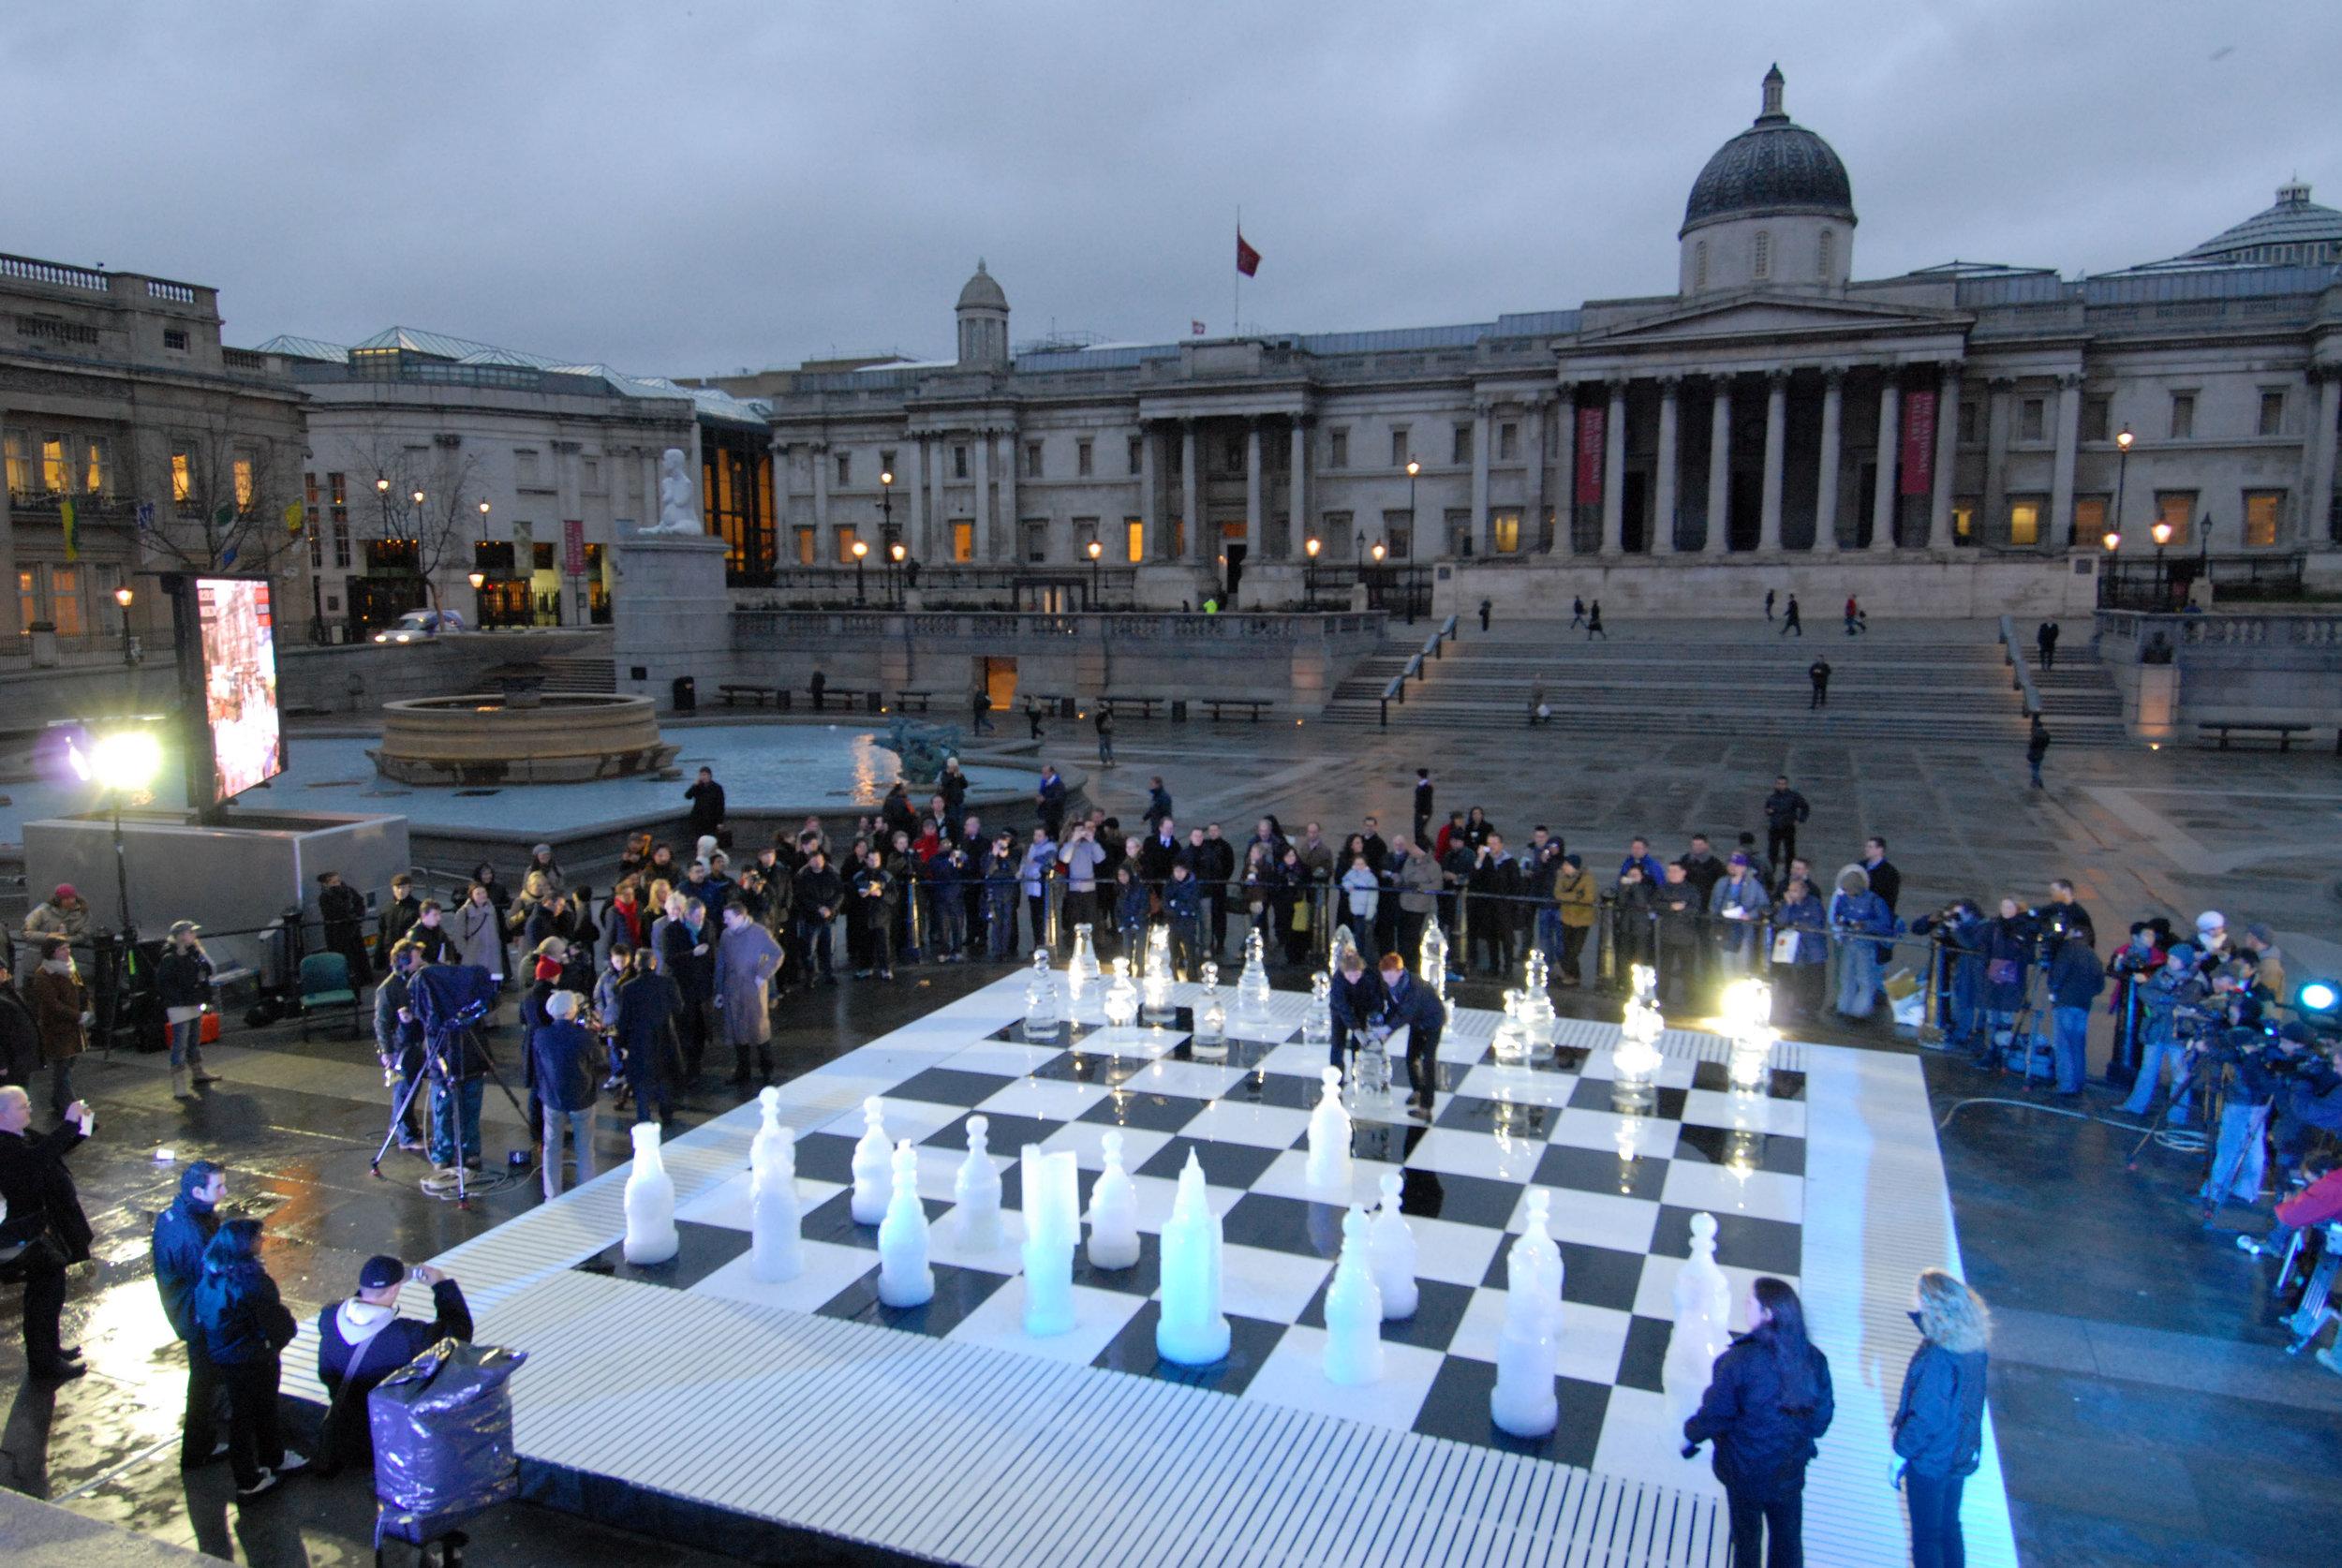 RWF2007 Chess Match 2007-01-11 09-08-03.jpg